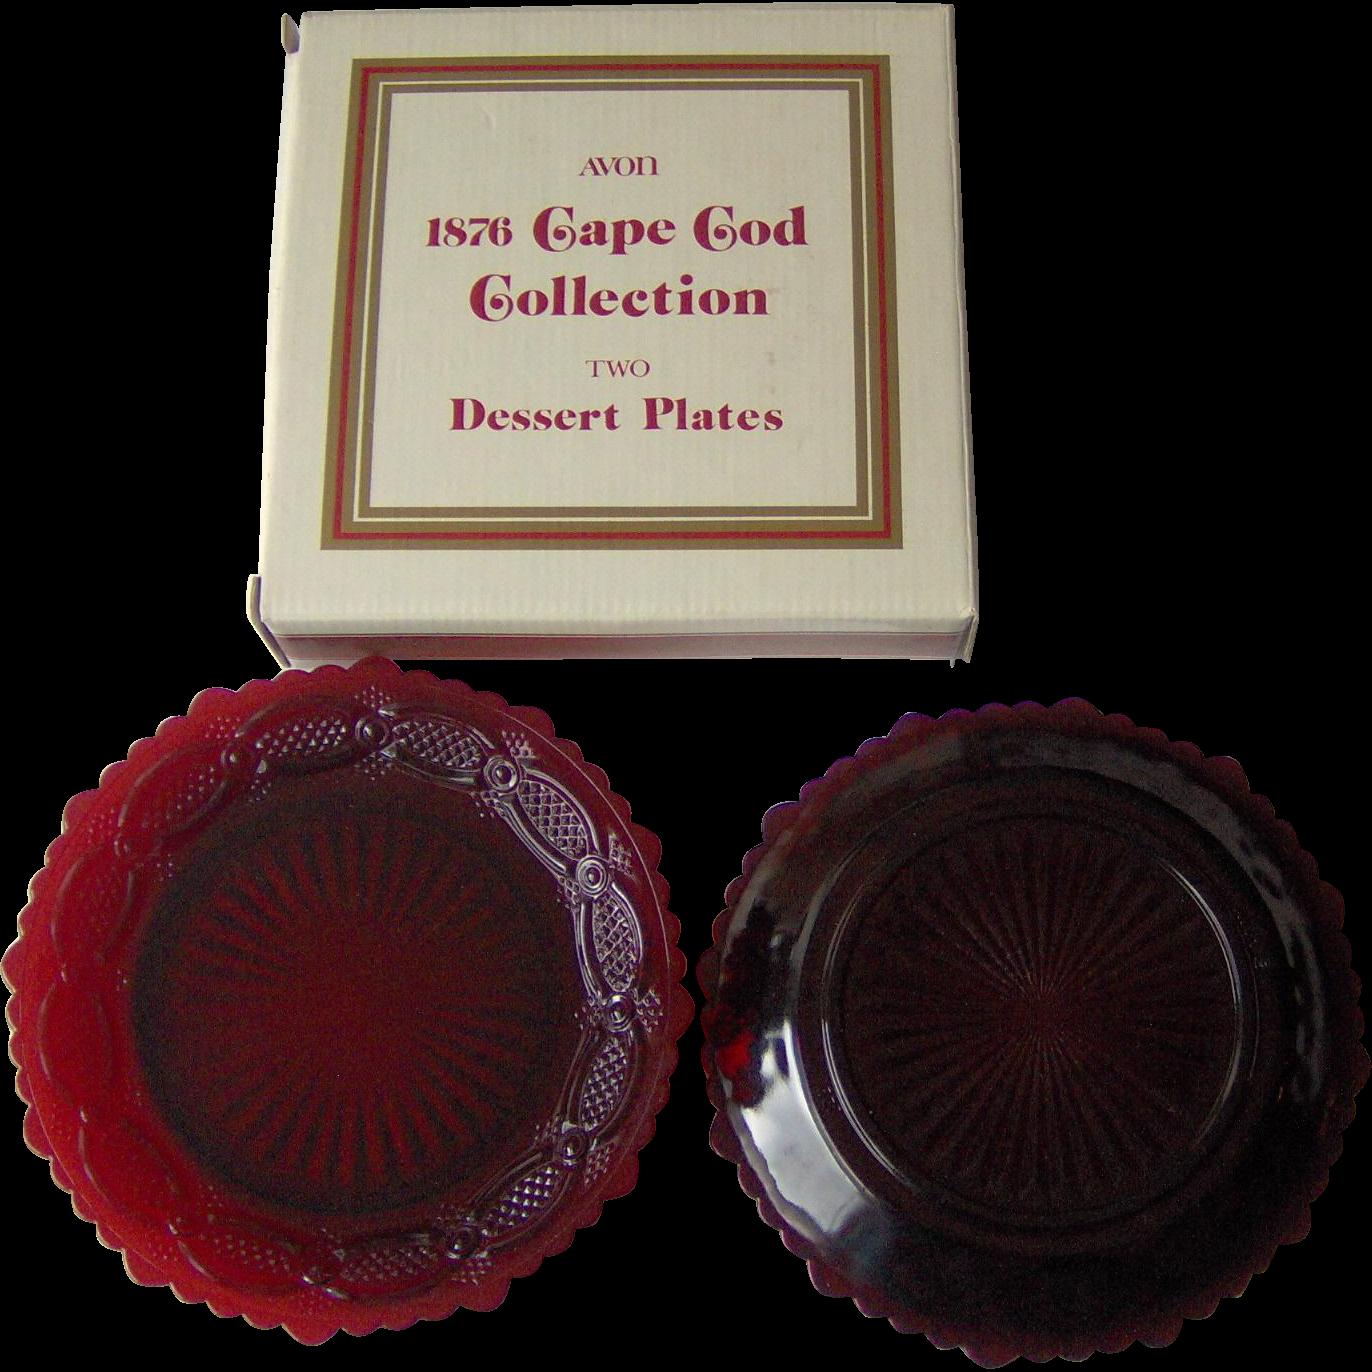 Vintage Avon Cape Cod Dessert Plates